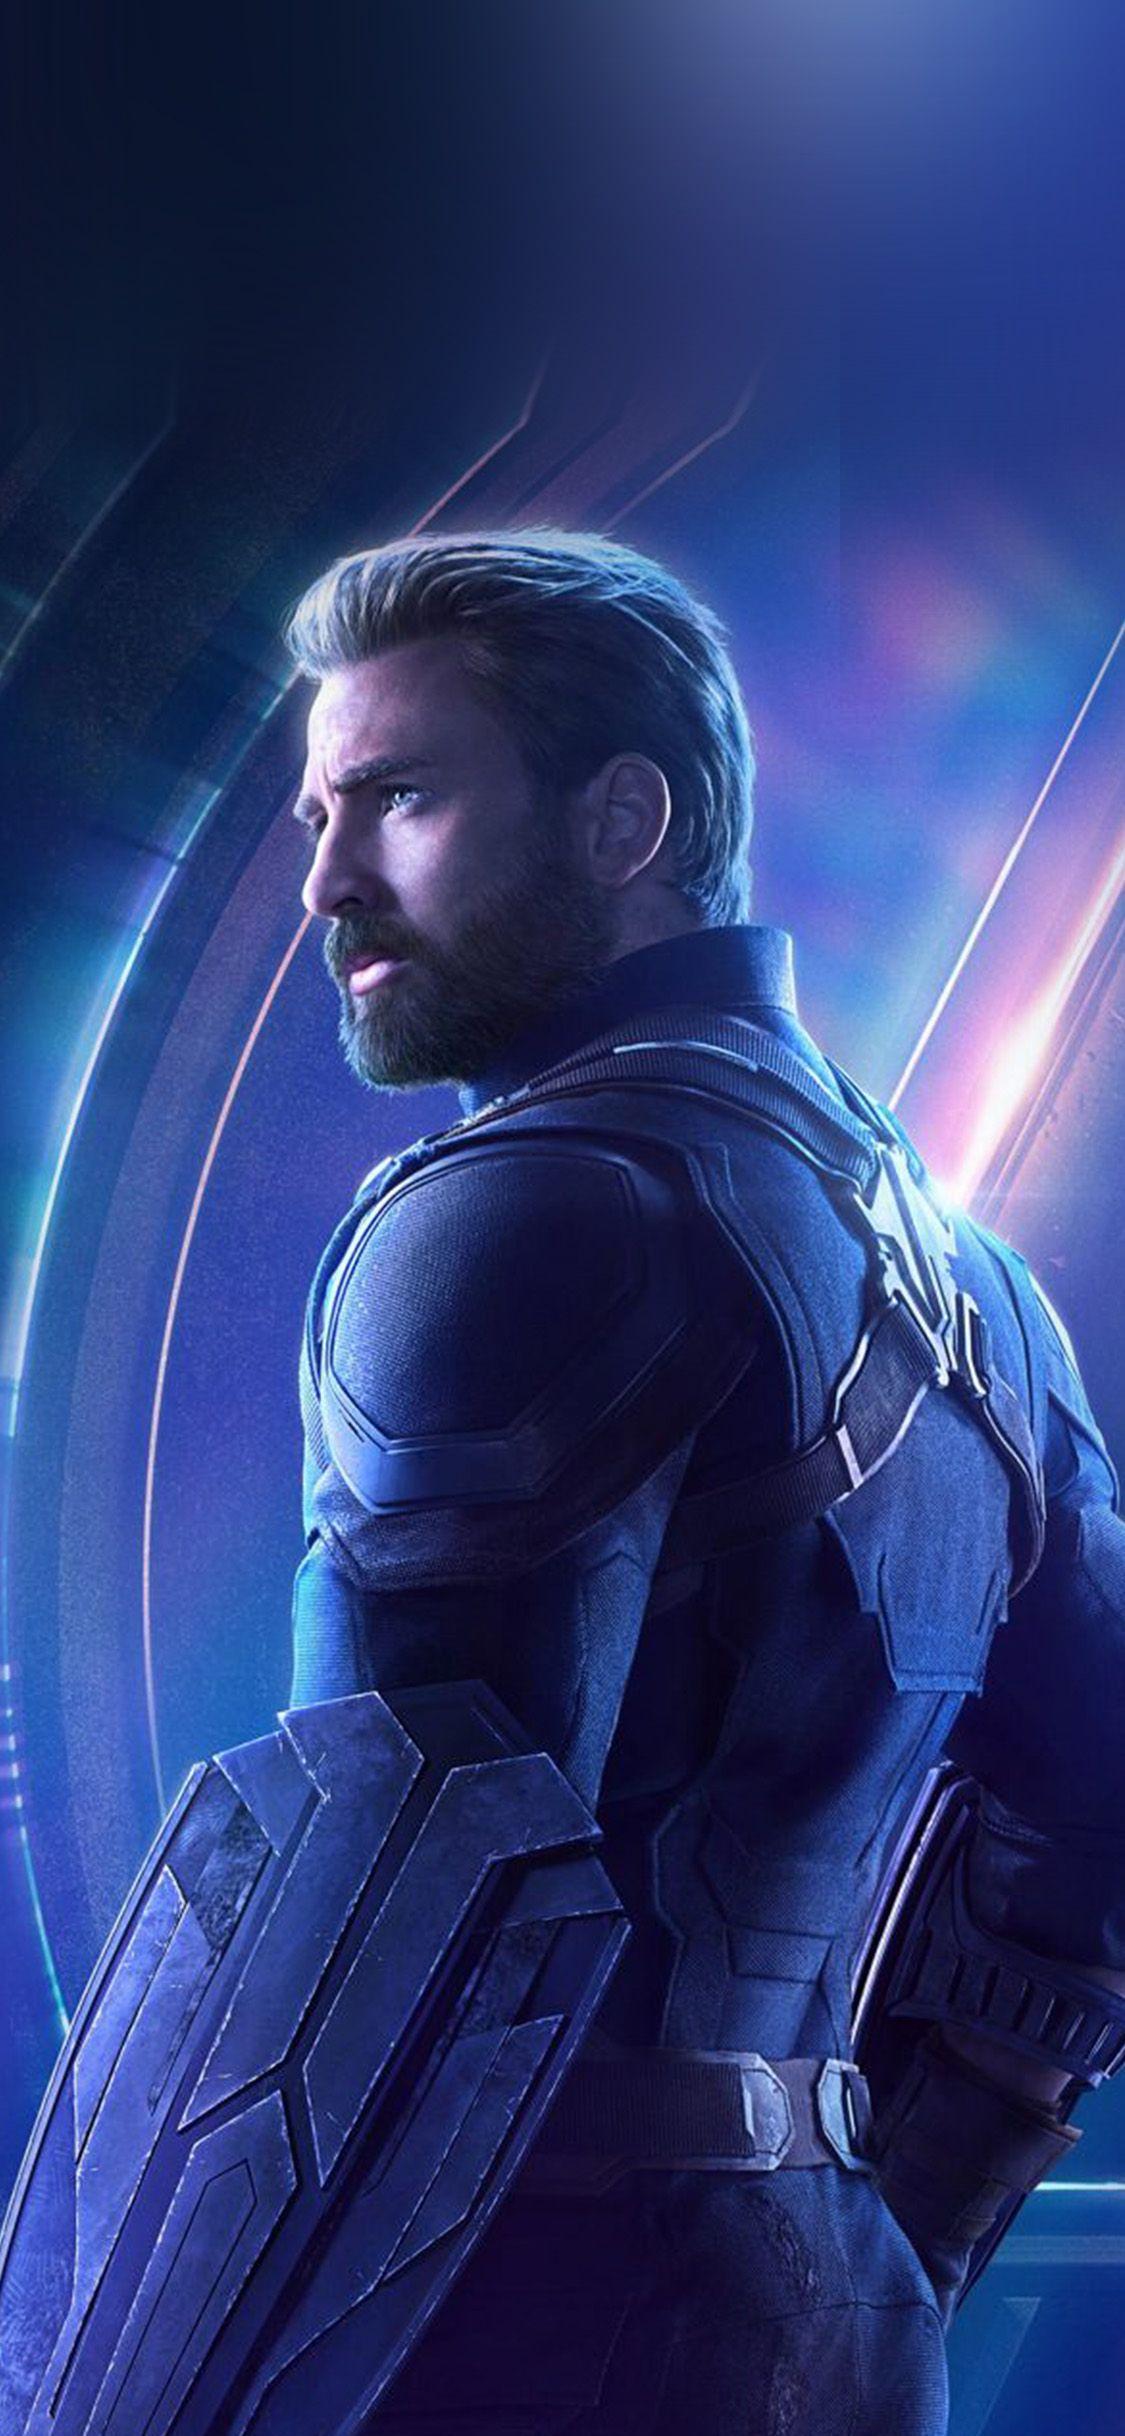 Обои Крис эванс, chris evans, мстители, steve rogers, captain america, the avengers. Фильмы foto 16